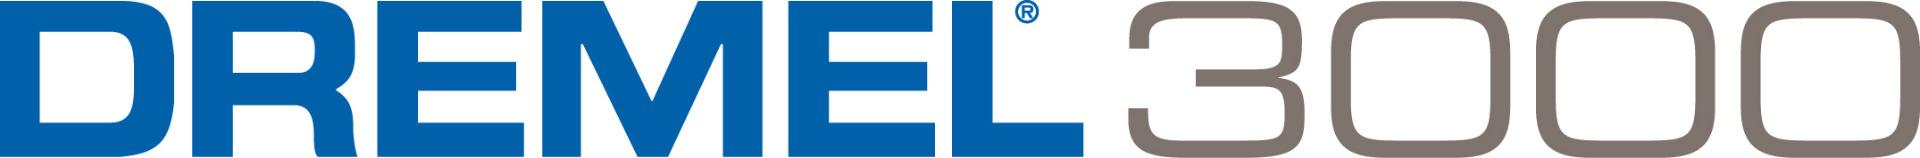 Dremel 3000 logo